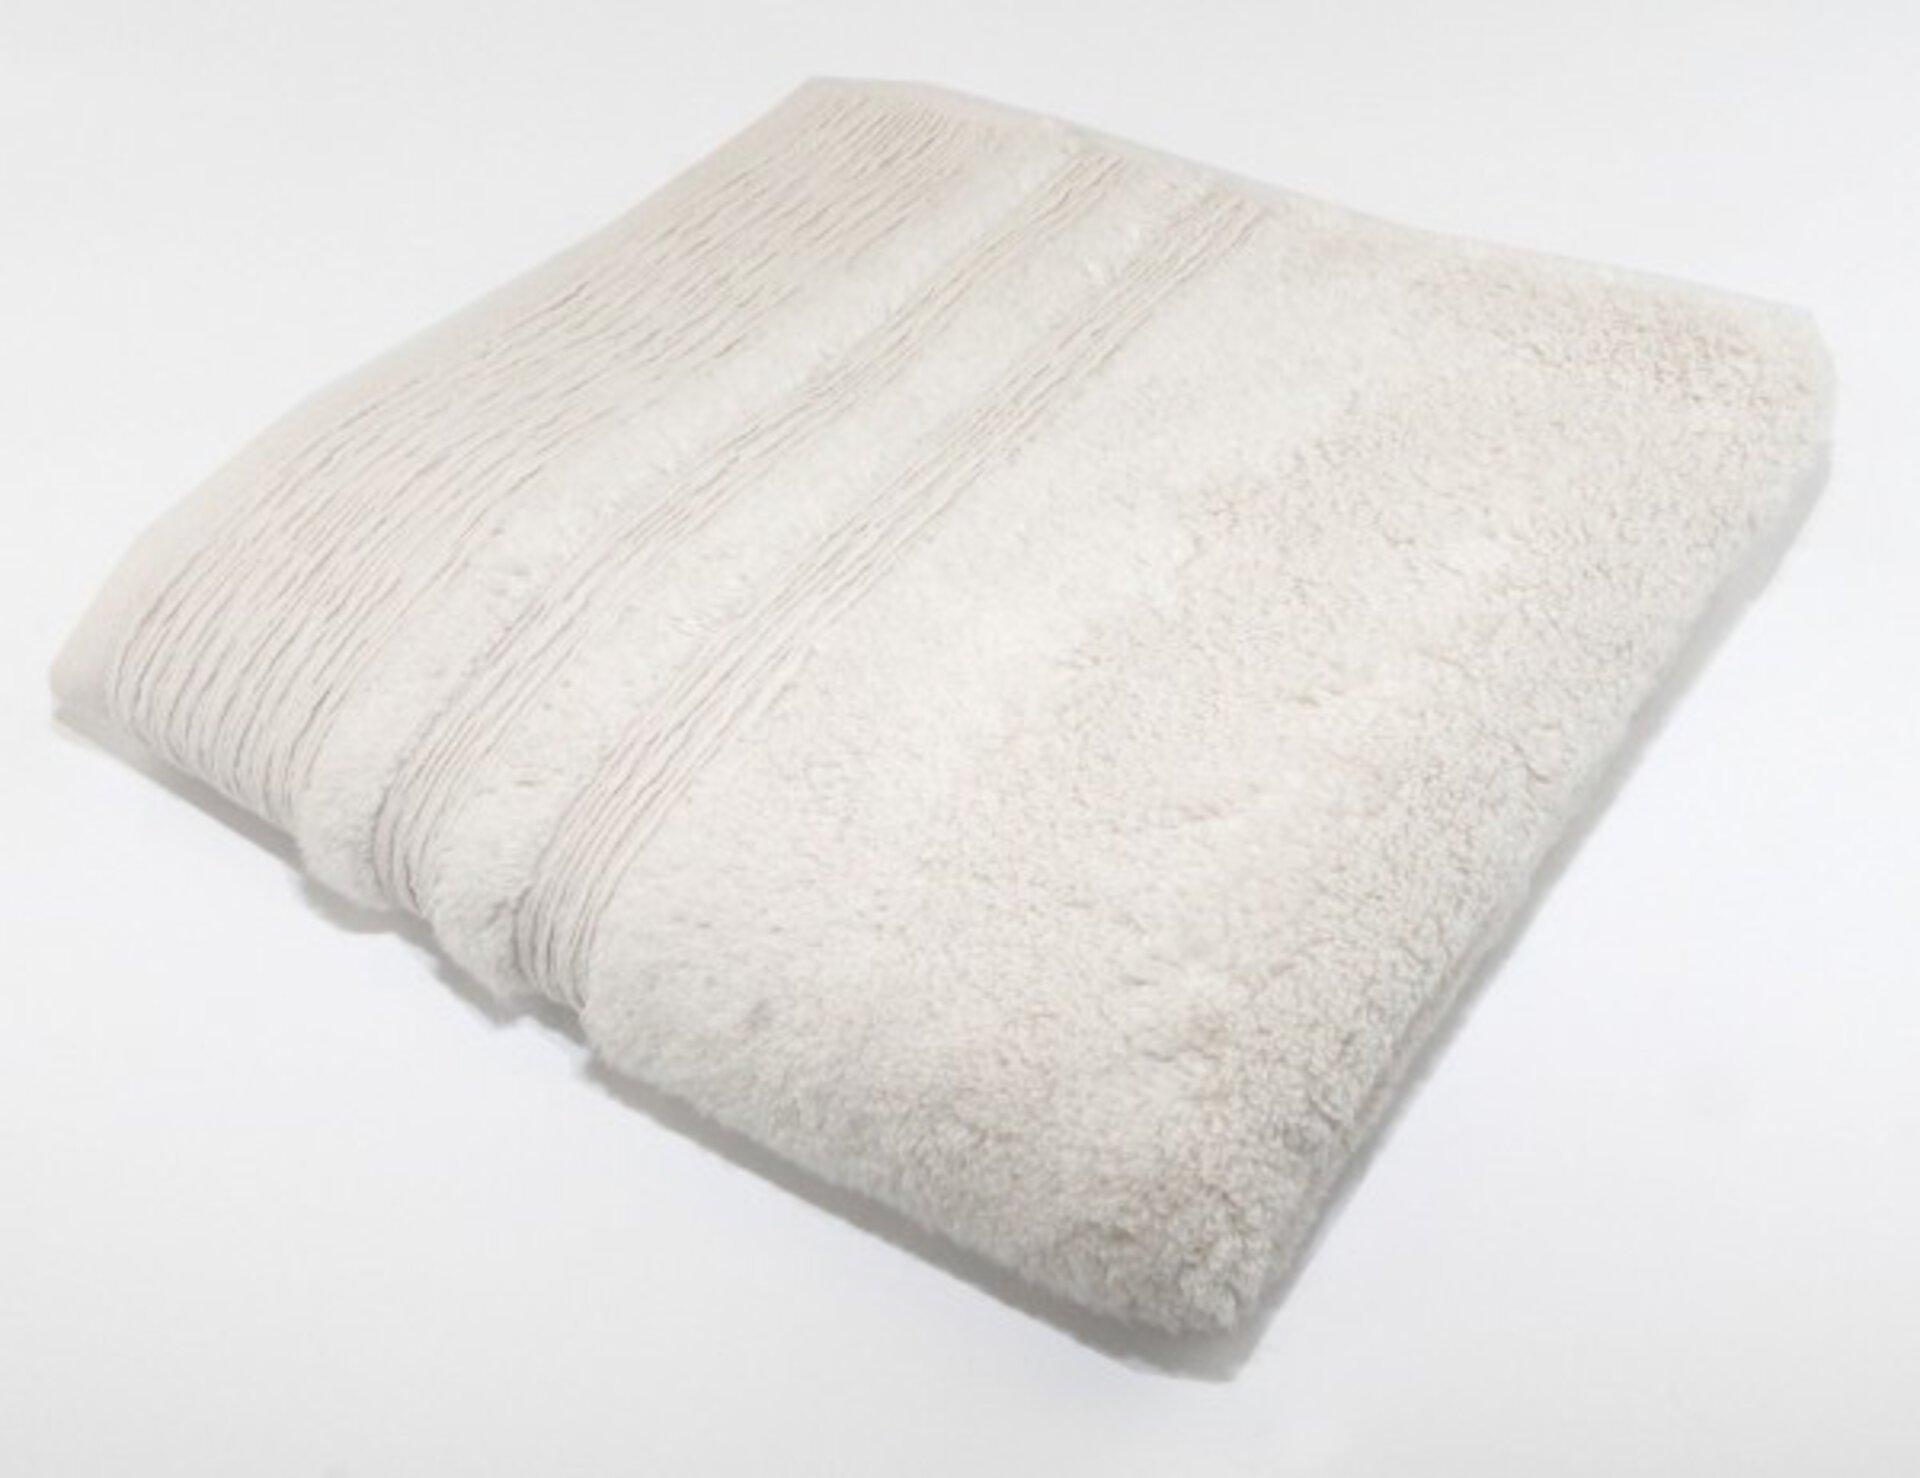 Badetuch Organic Kenborg Textil beige 100 x 150 cm